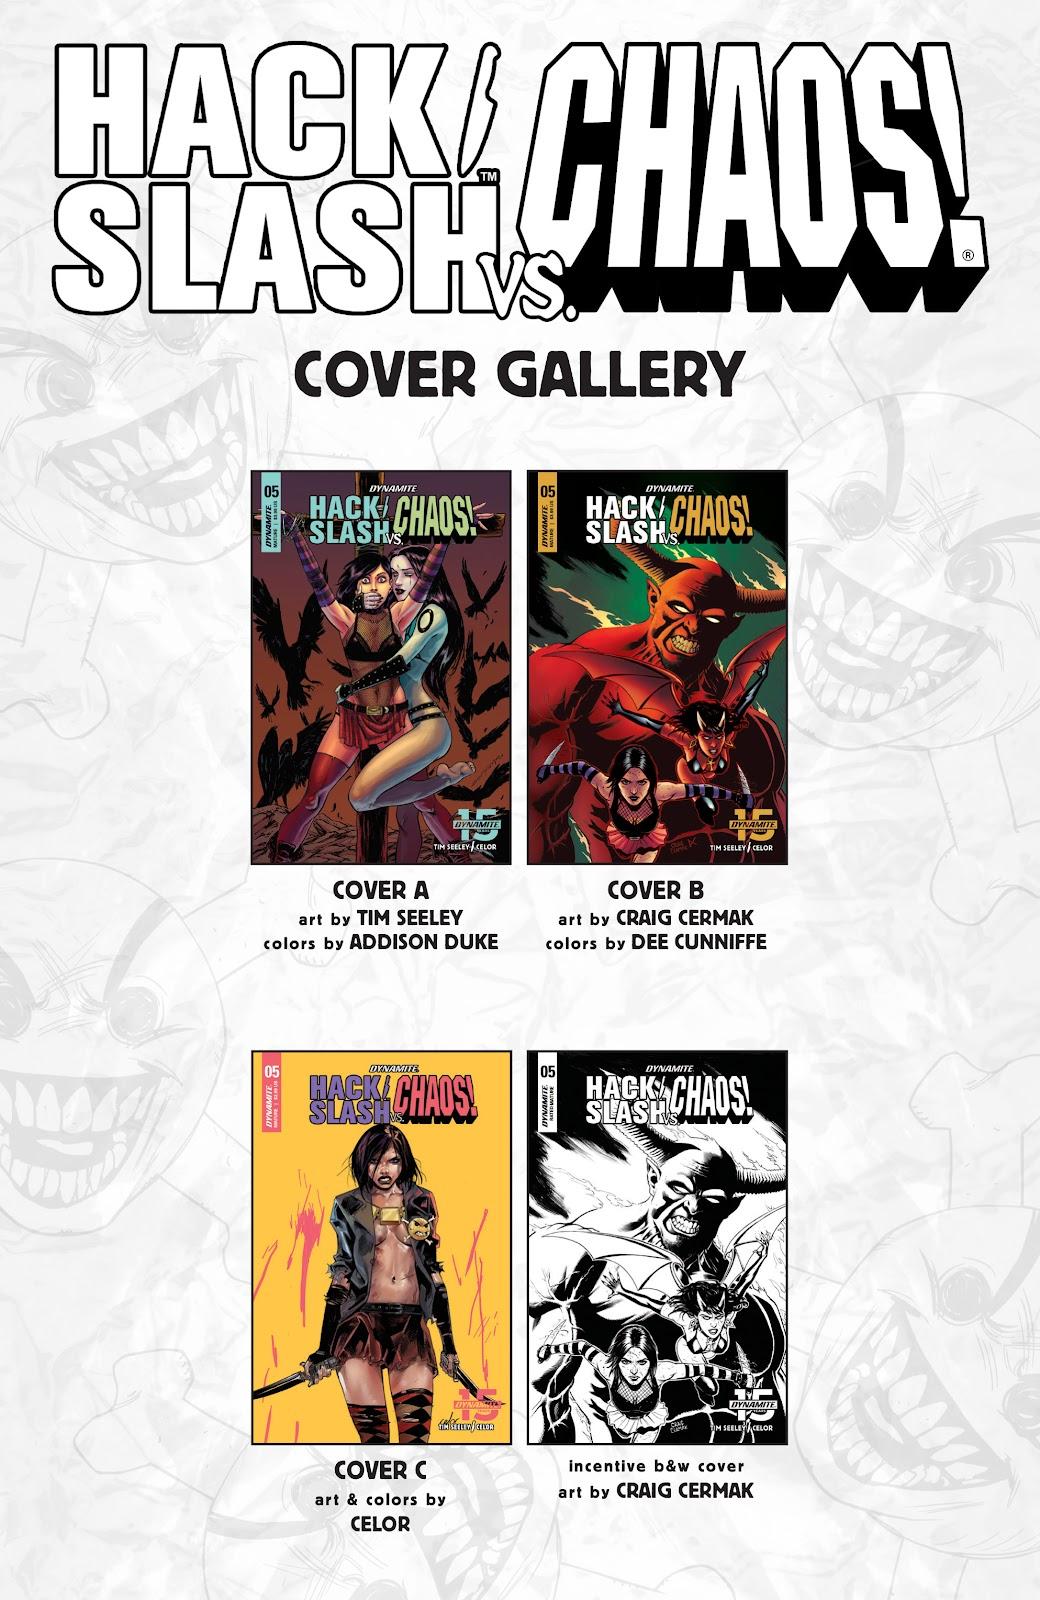 Read online Hack/Slash vs. Chaos comic -  Issue #5 - 25